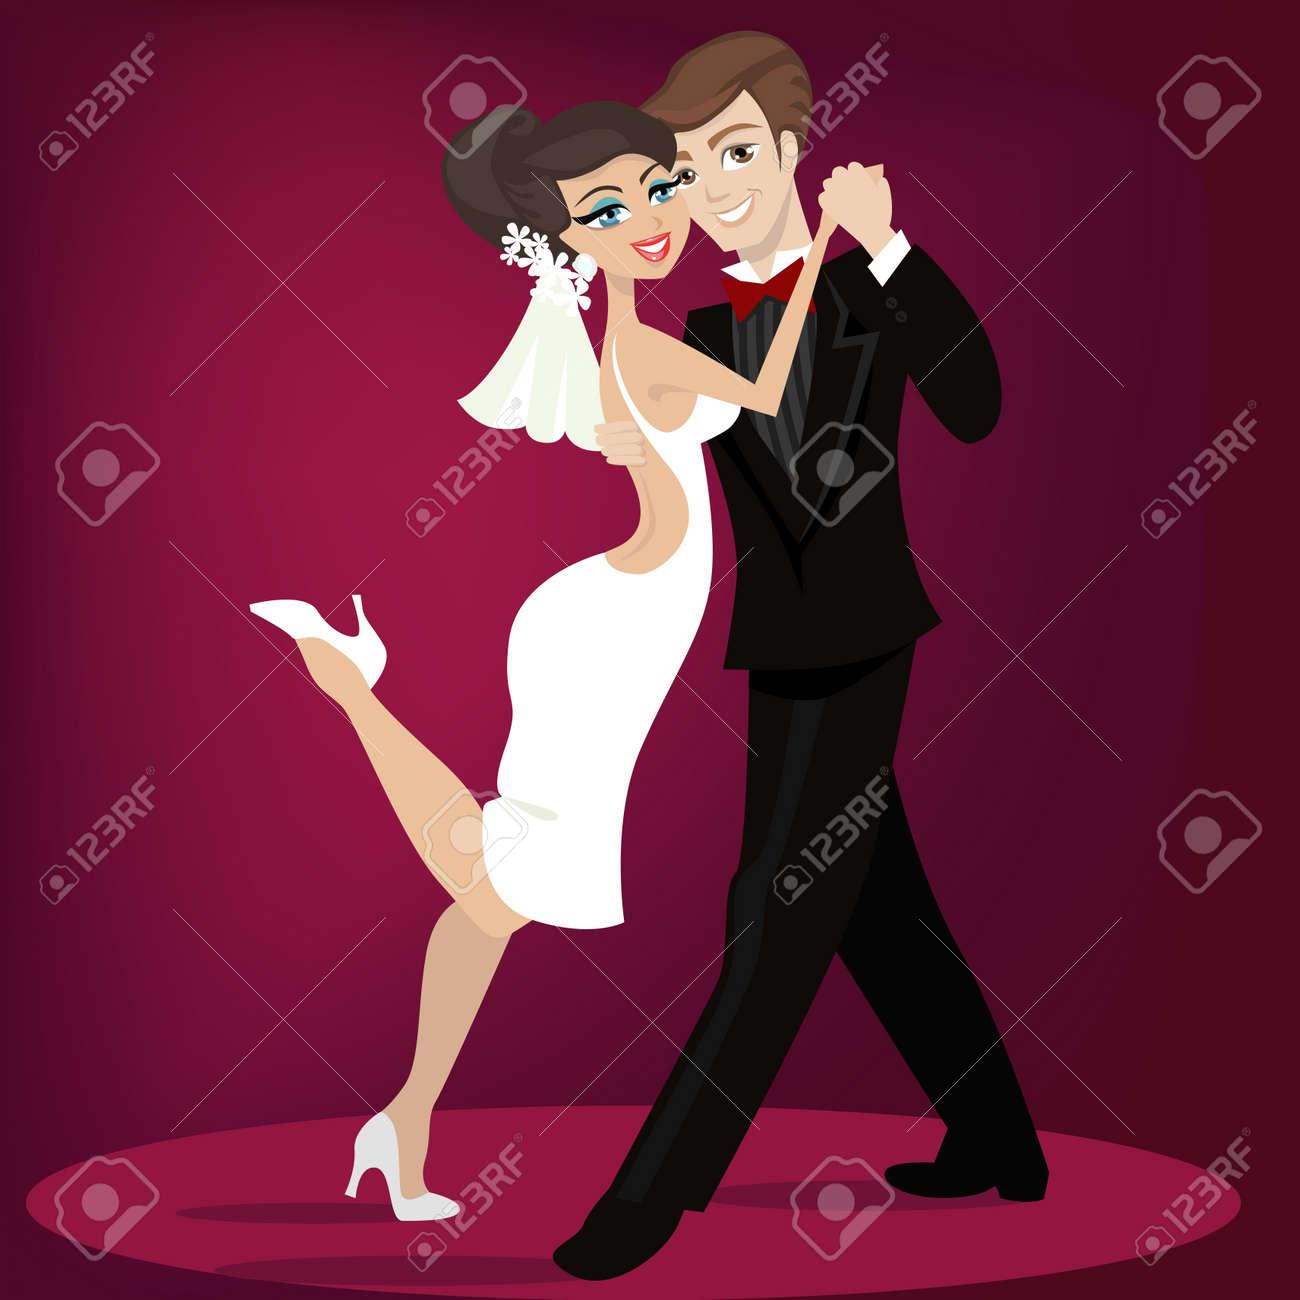 wedding illustration - 8478993